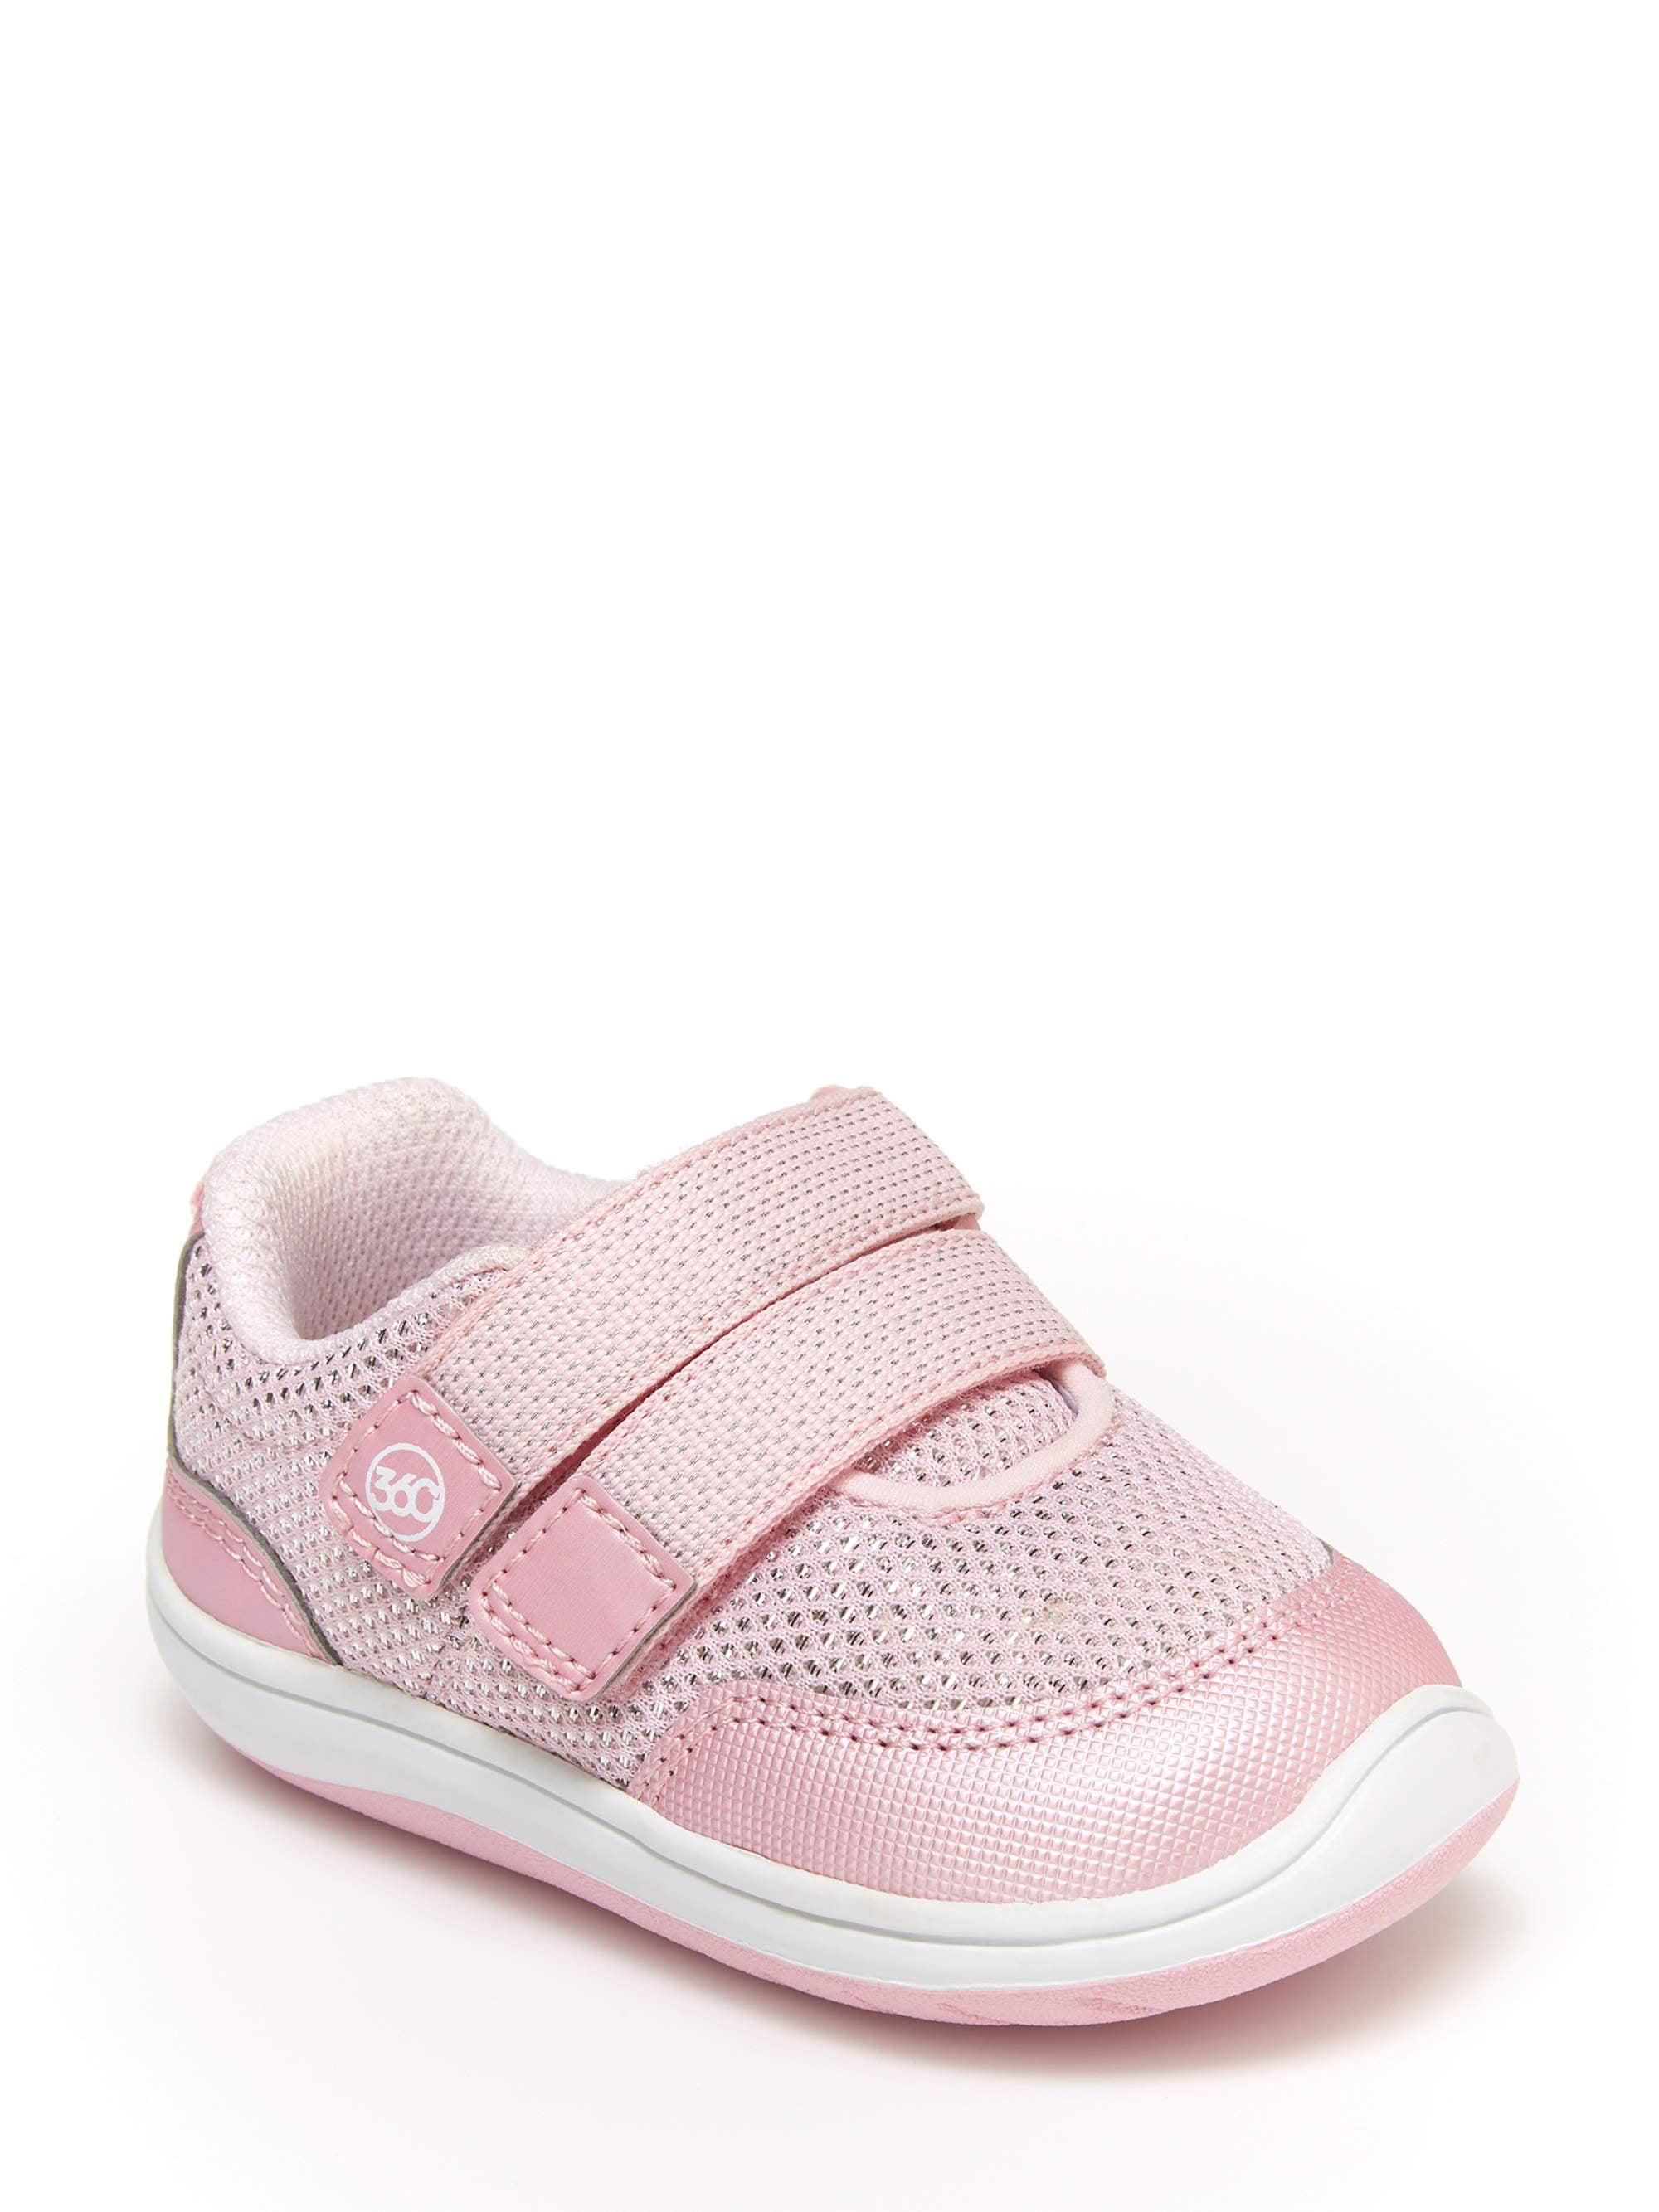 Stride Rite 360 Dash Sneakers (Infant